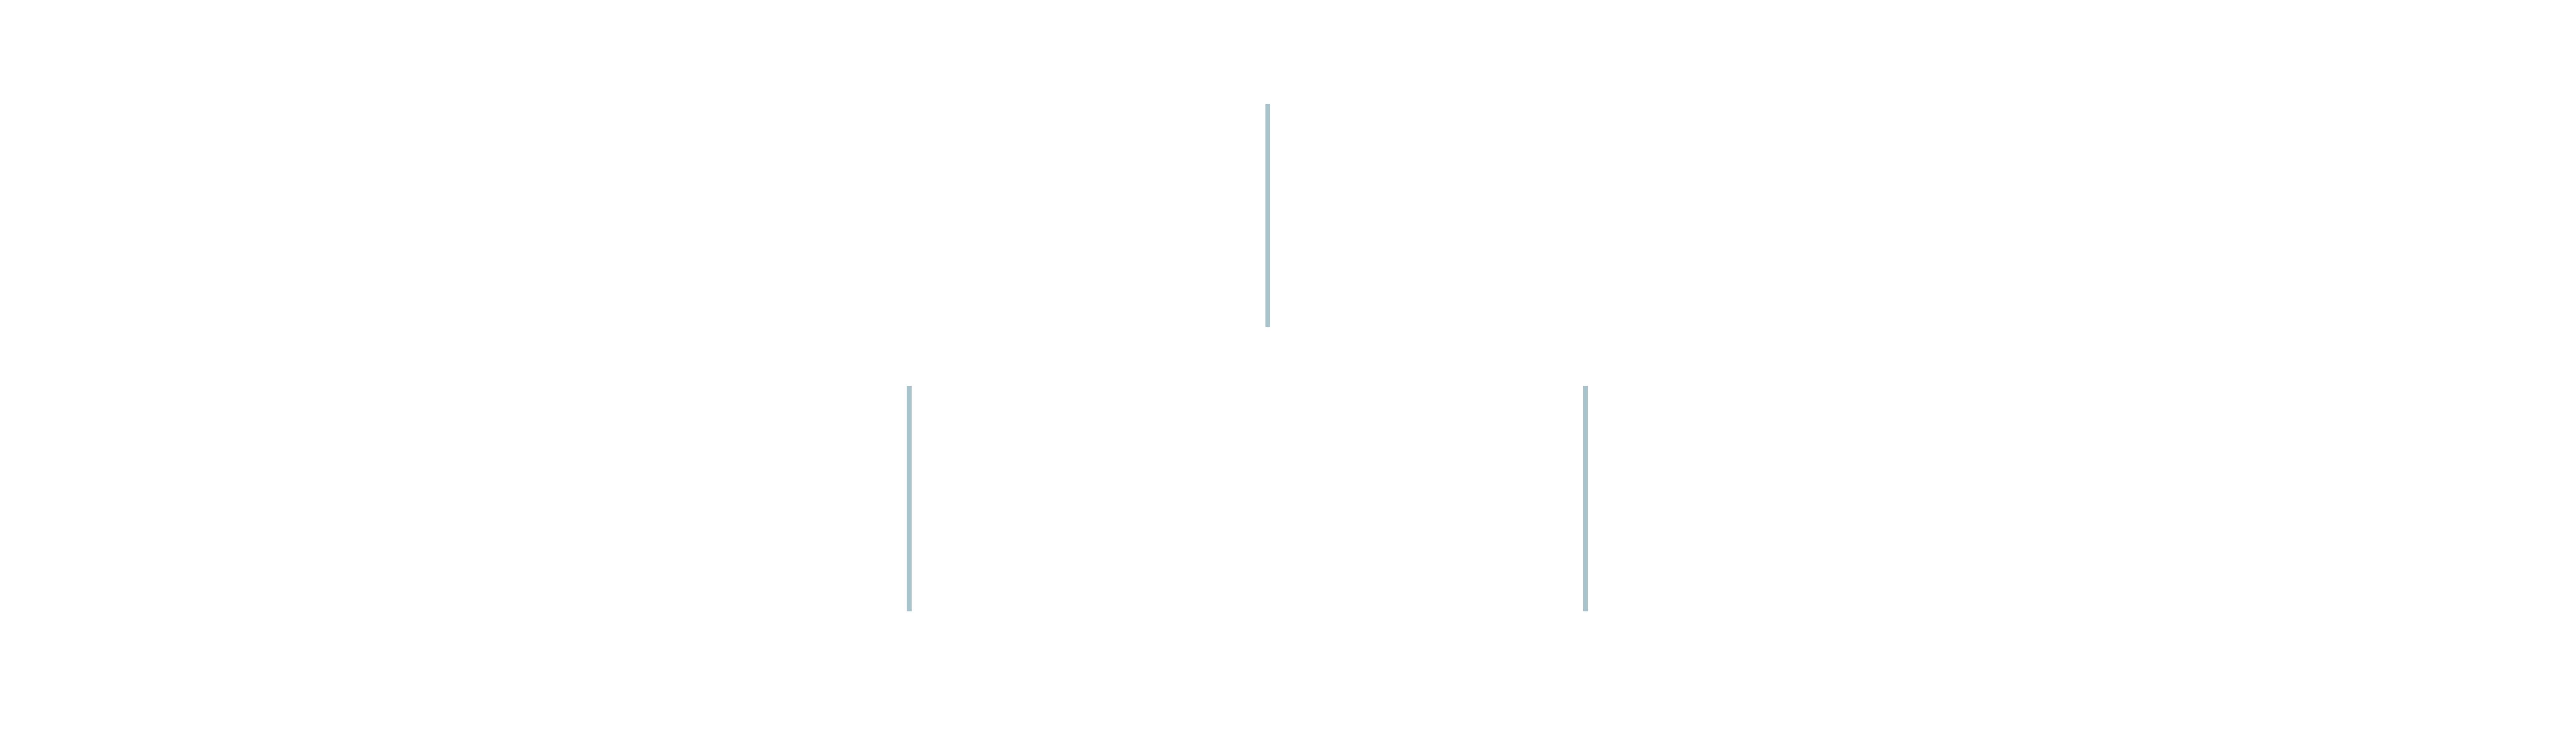 UCHealth and CU School of Medicine data